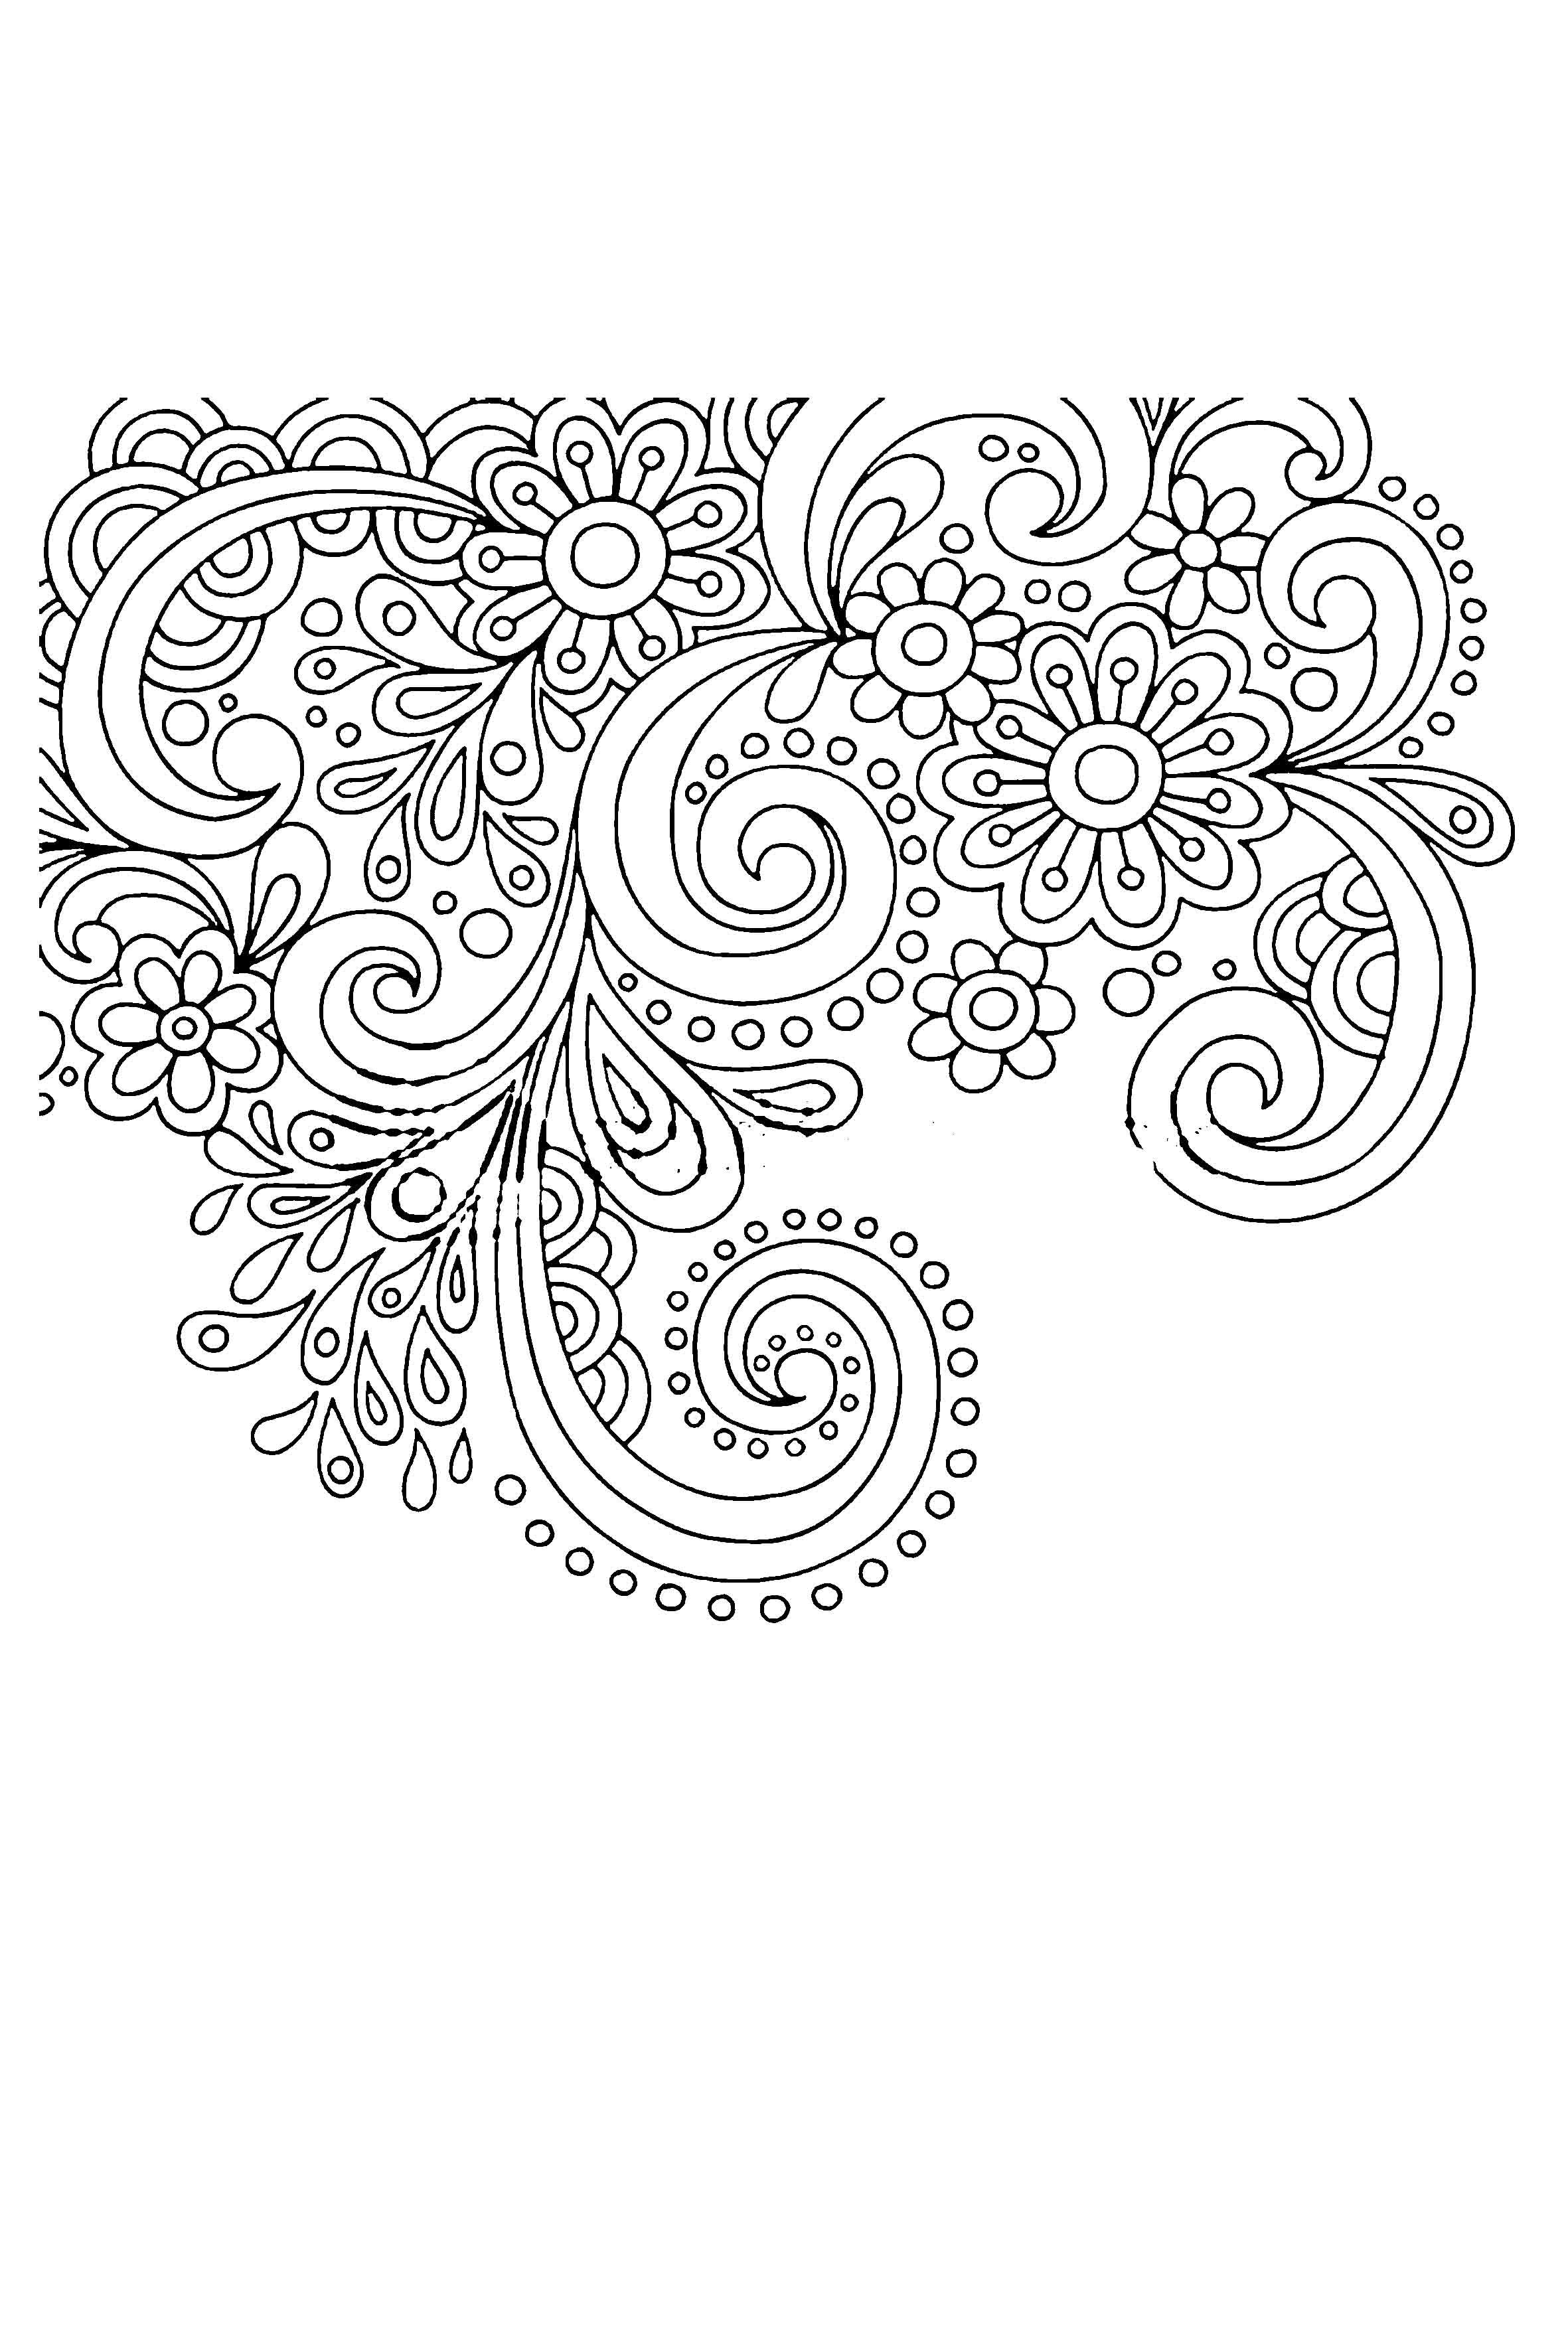 Skull Tattoo On Hand Tumblr Crafty Henna Designs Drawings Henna